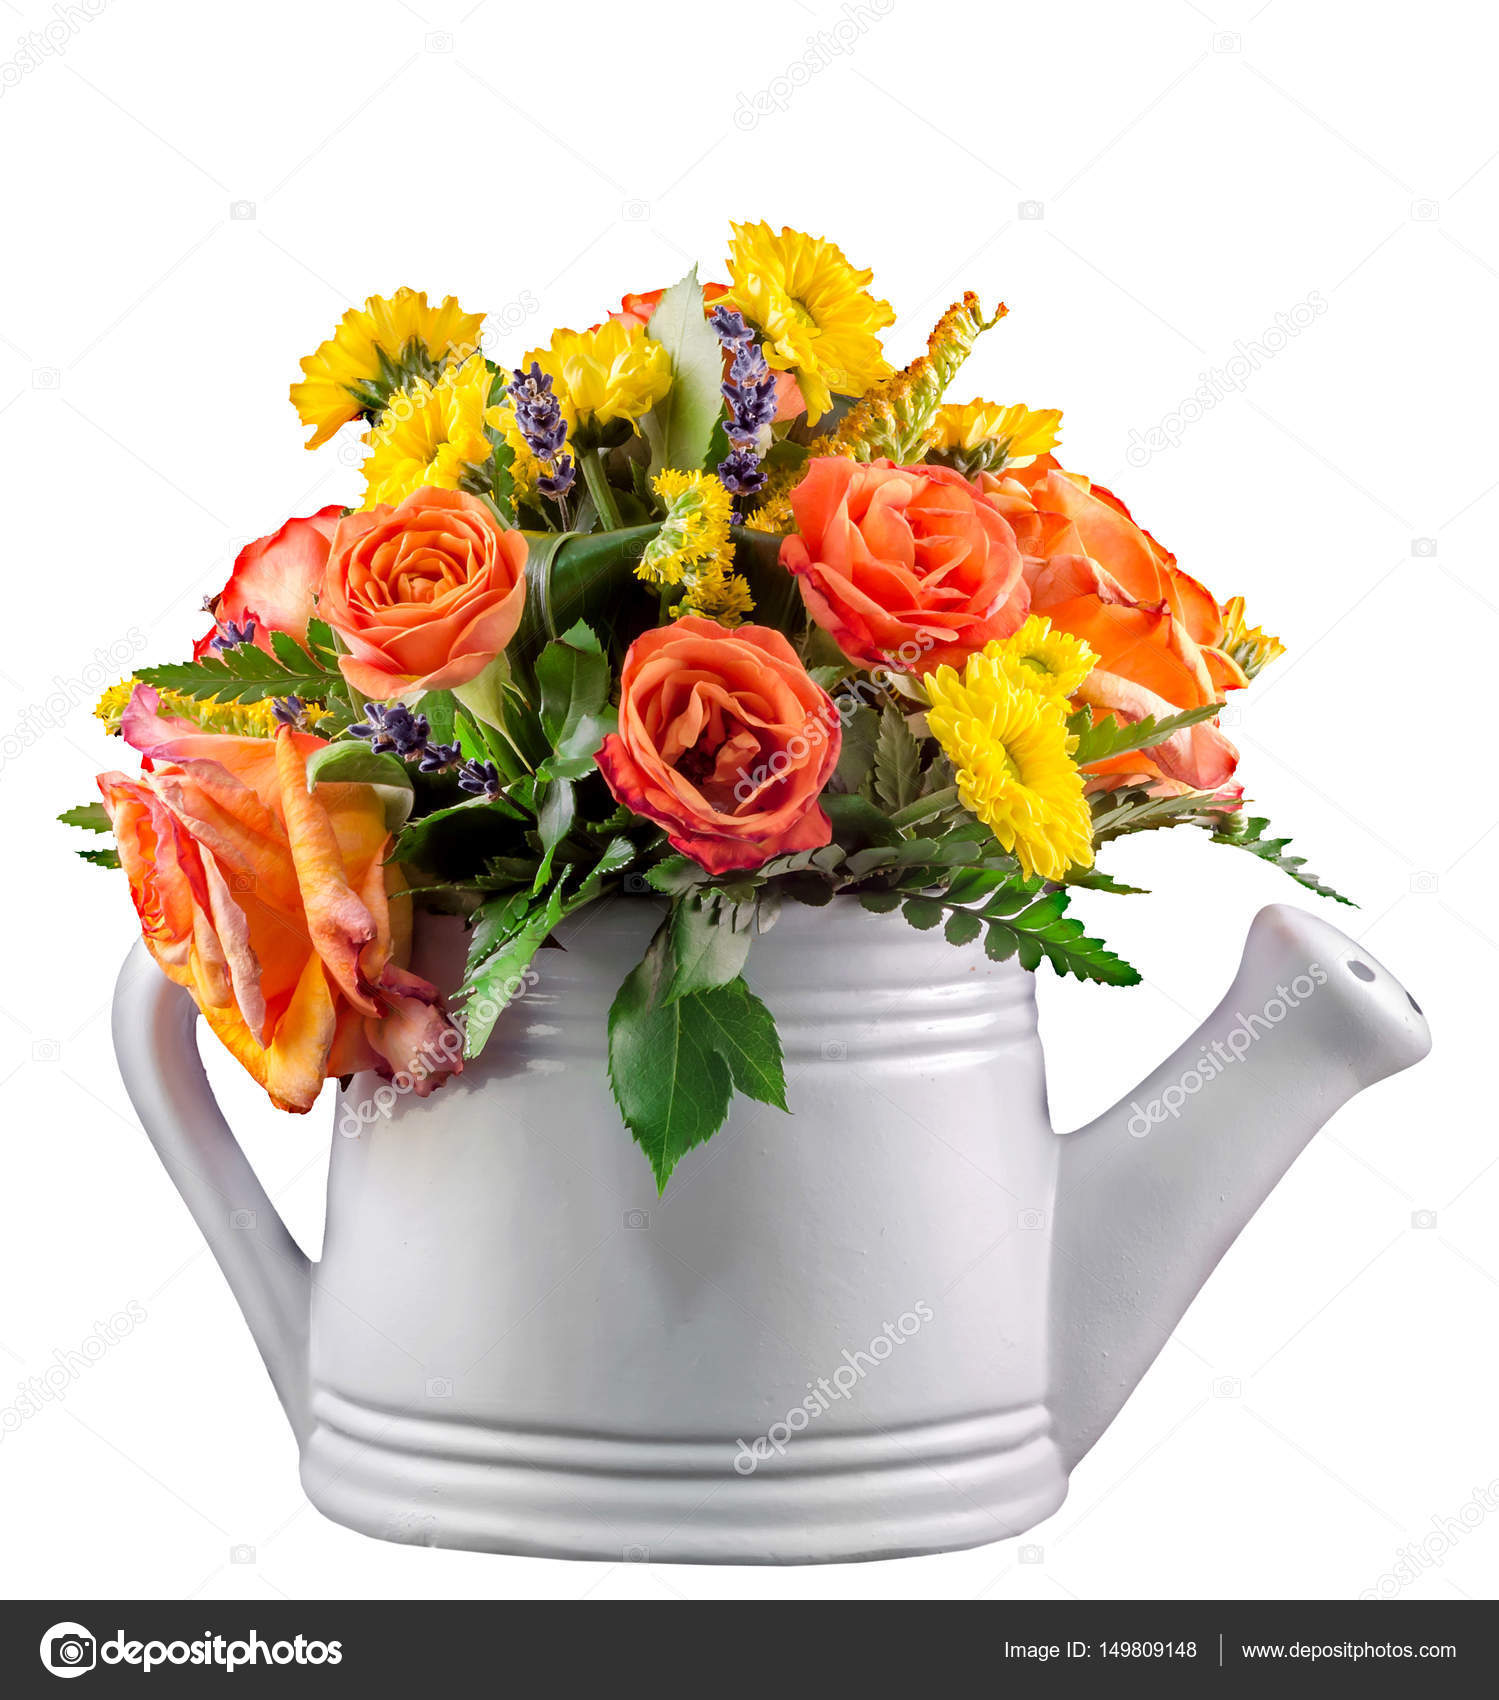 Vivid Colored Flowers Orange Roses In A White Sprinkler Water